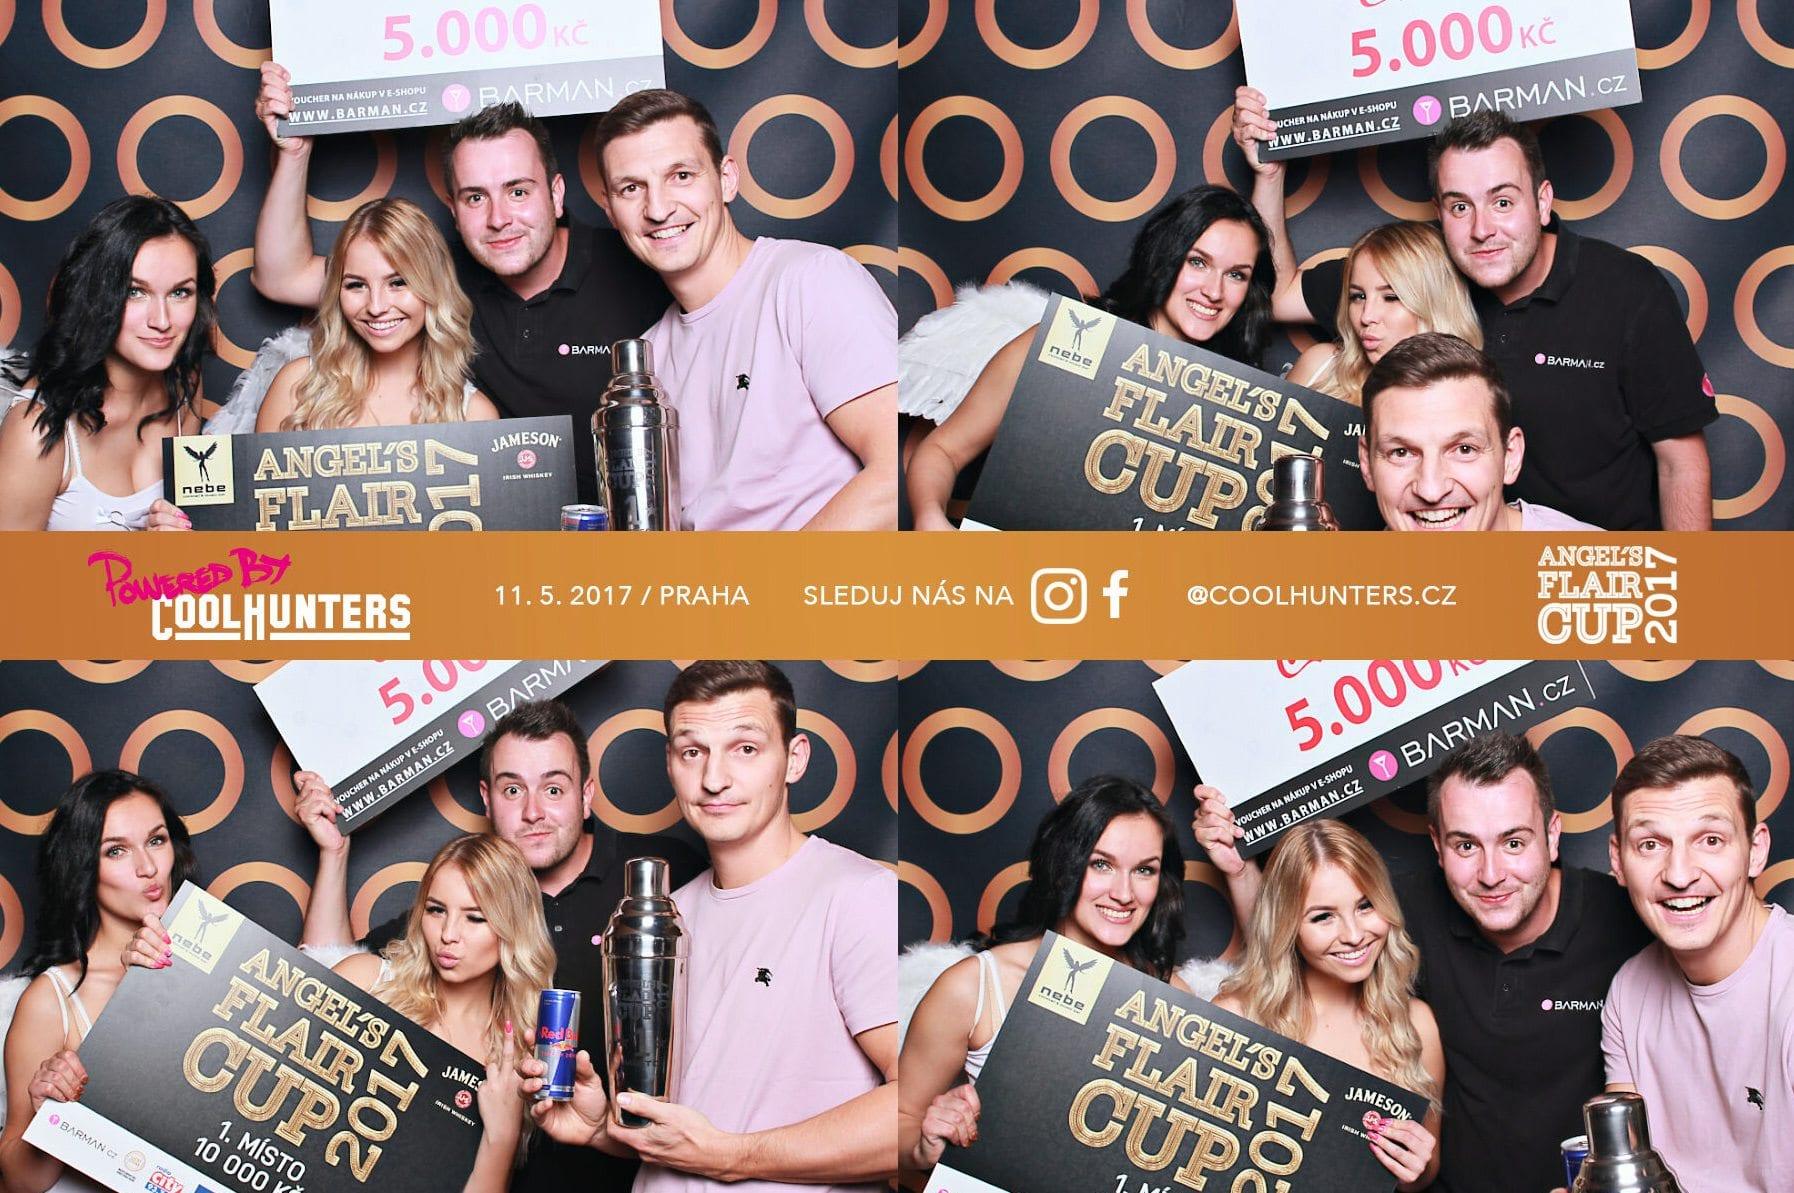 fotokoutek-coolhunters-angels-flair-cup-2017-246492